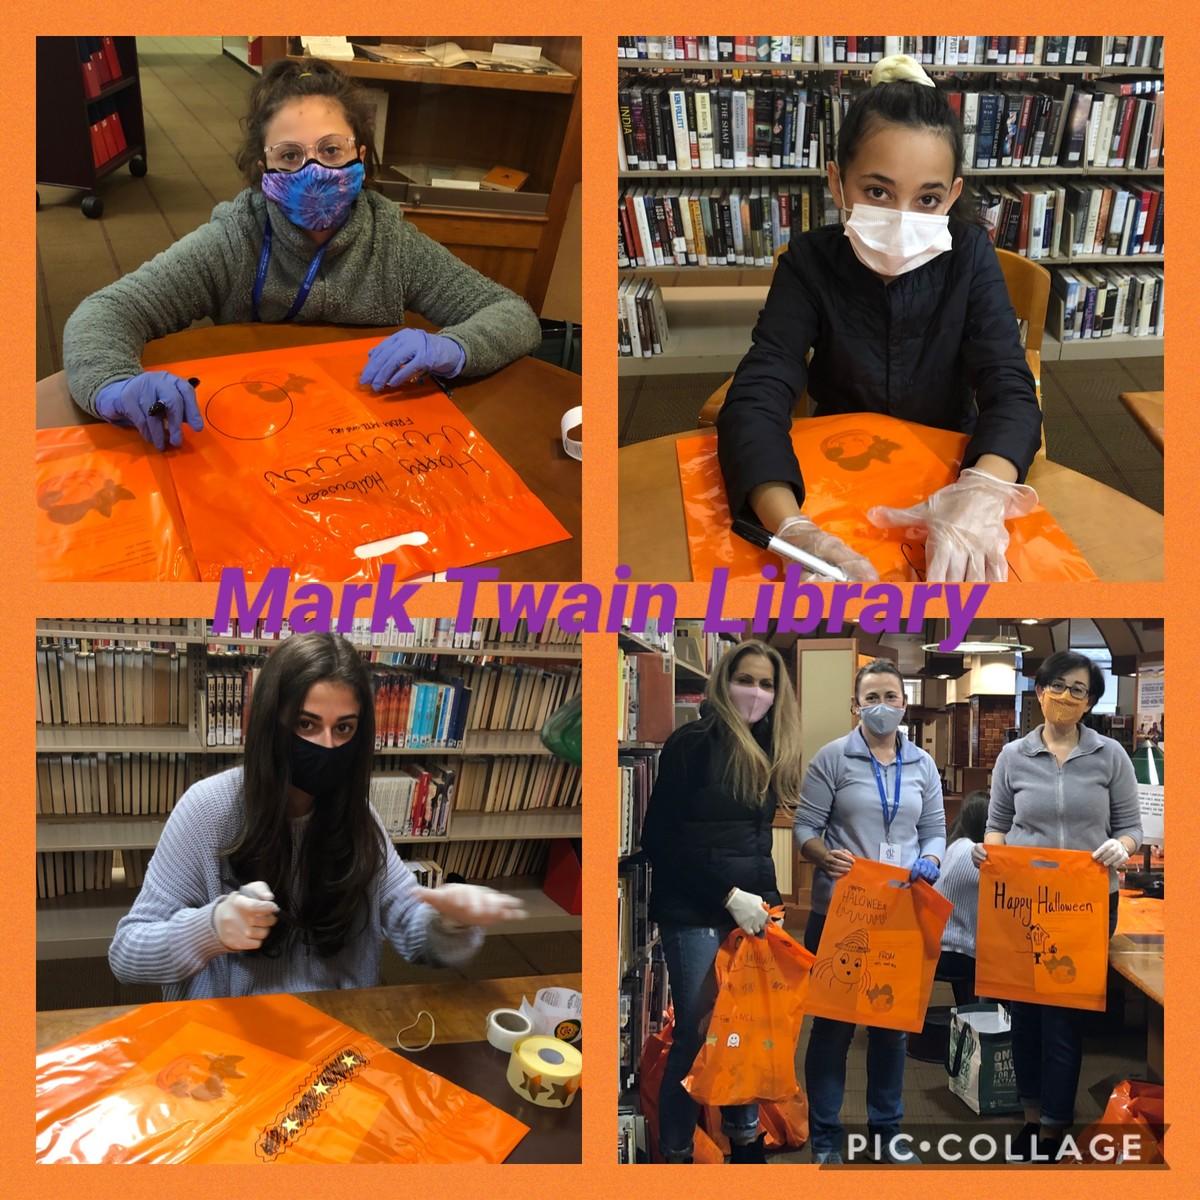 Mark Twain Library Goodie Bag Making